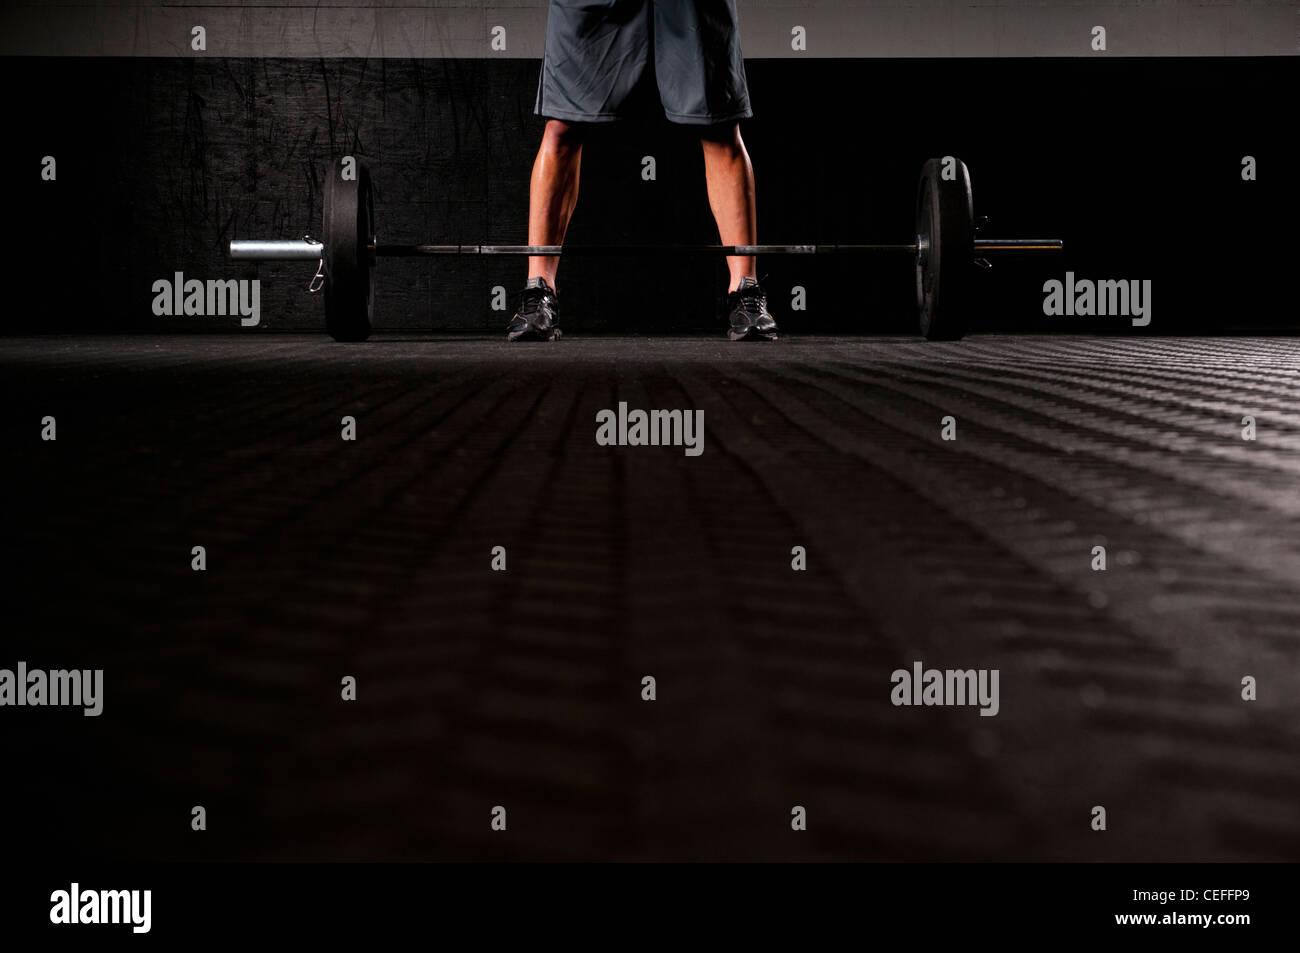 Hombre de pie con pesas Imagen De Stock